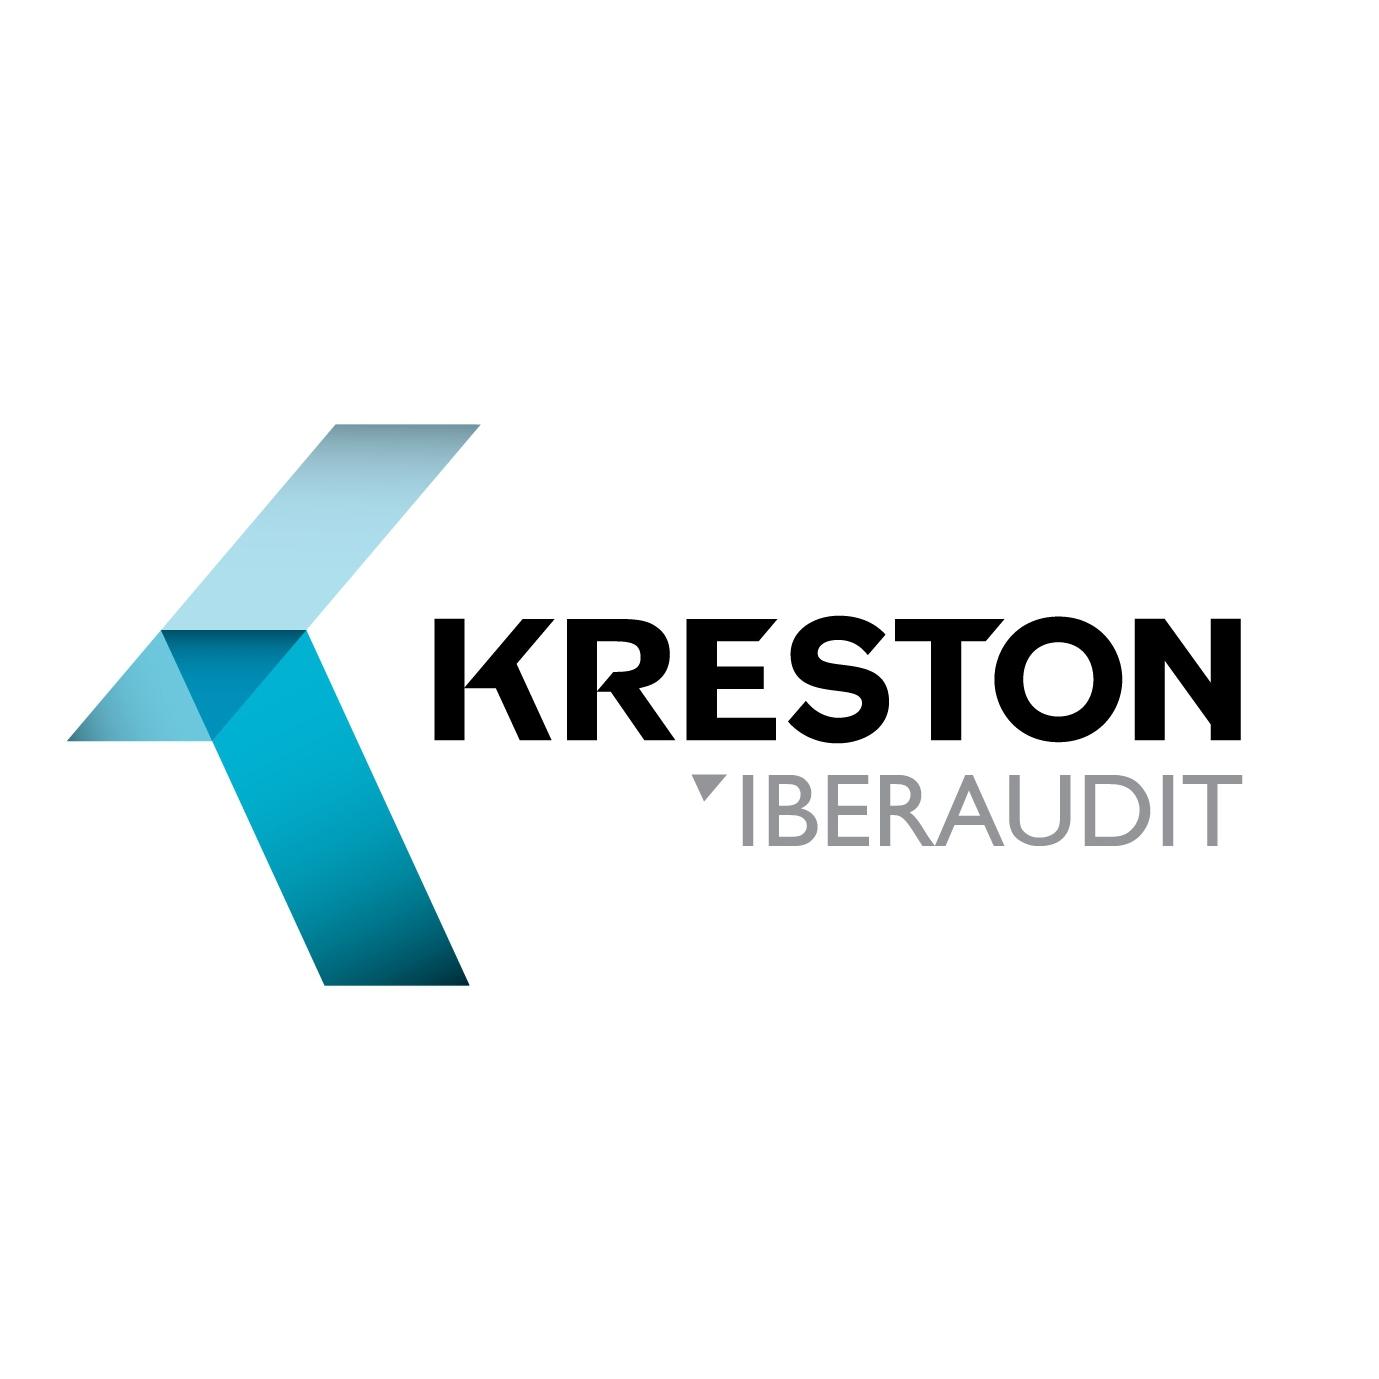 KRESTON IBERAUDIT